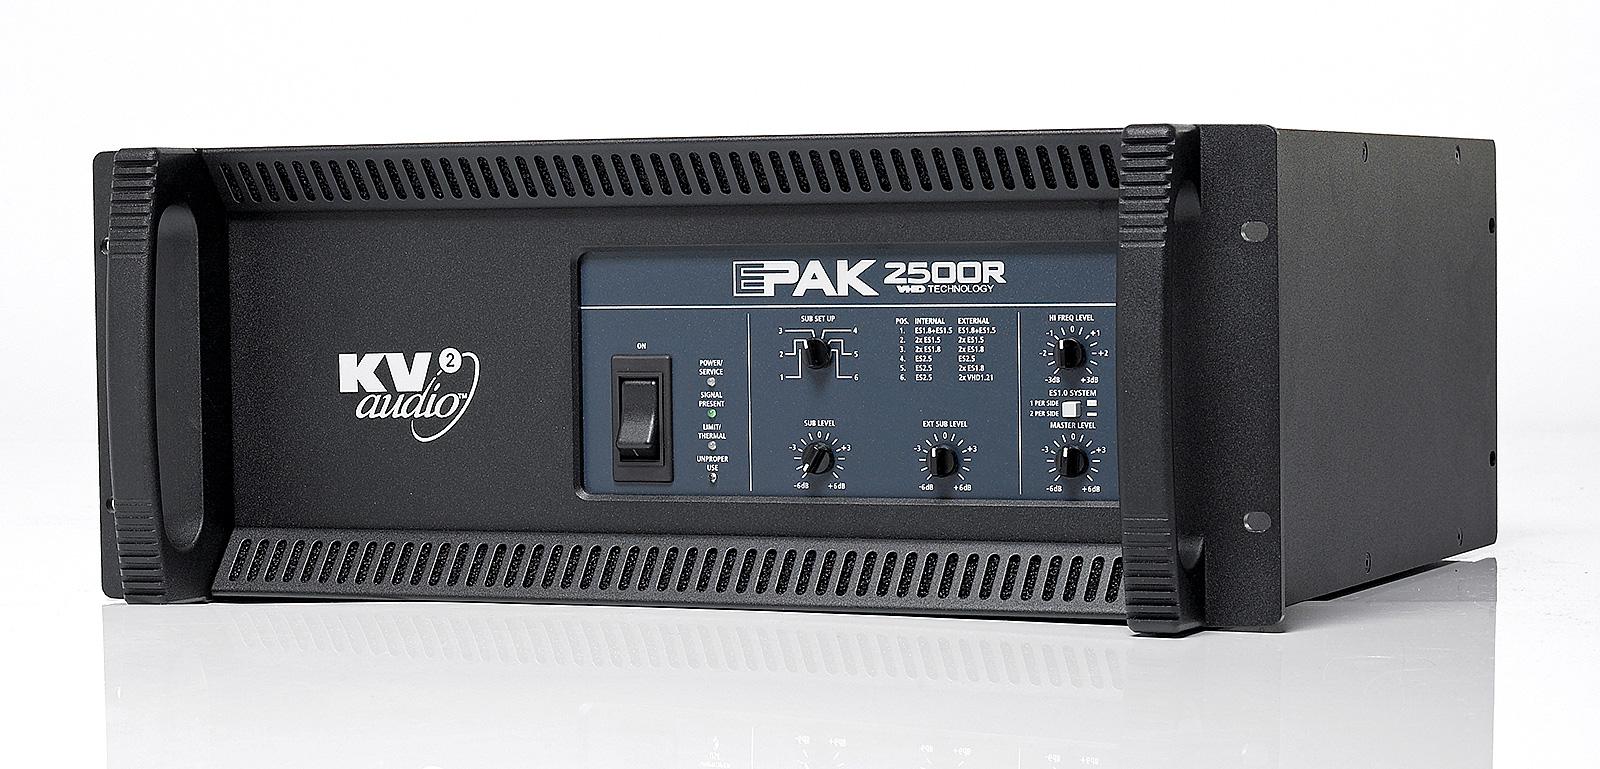 KV2 Audio EPAK 2500R